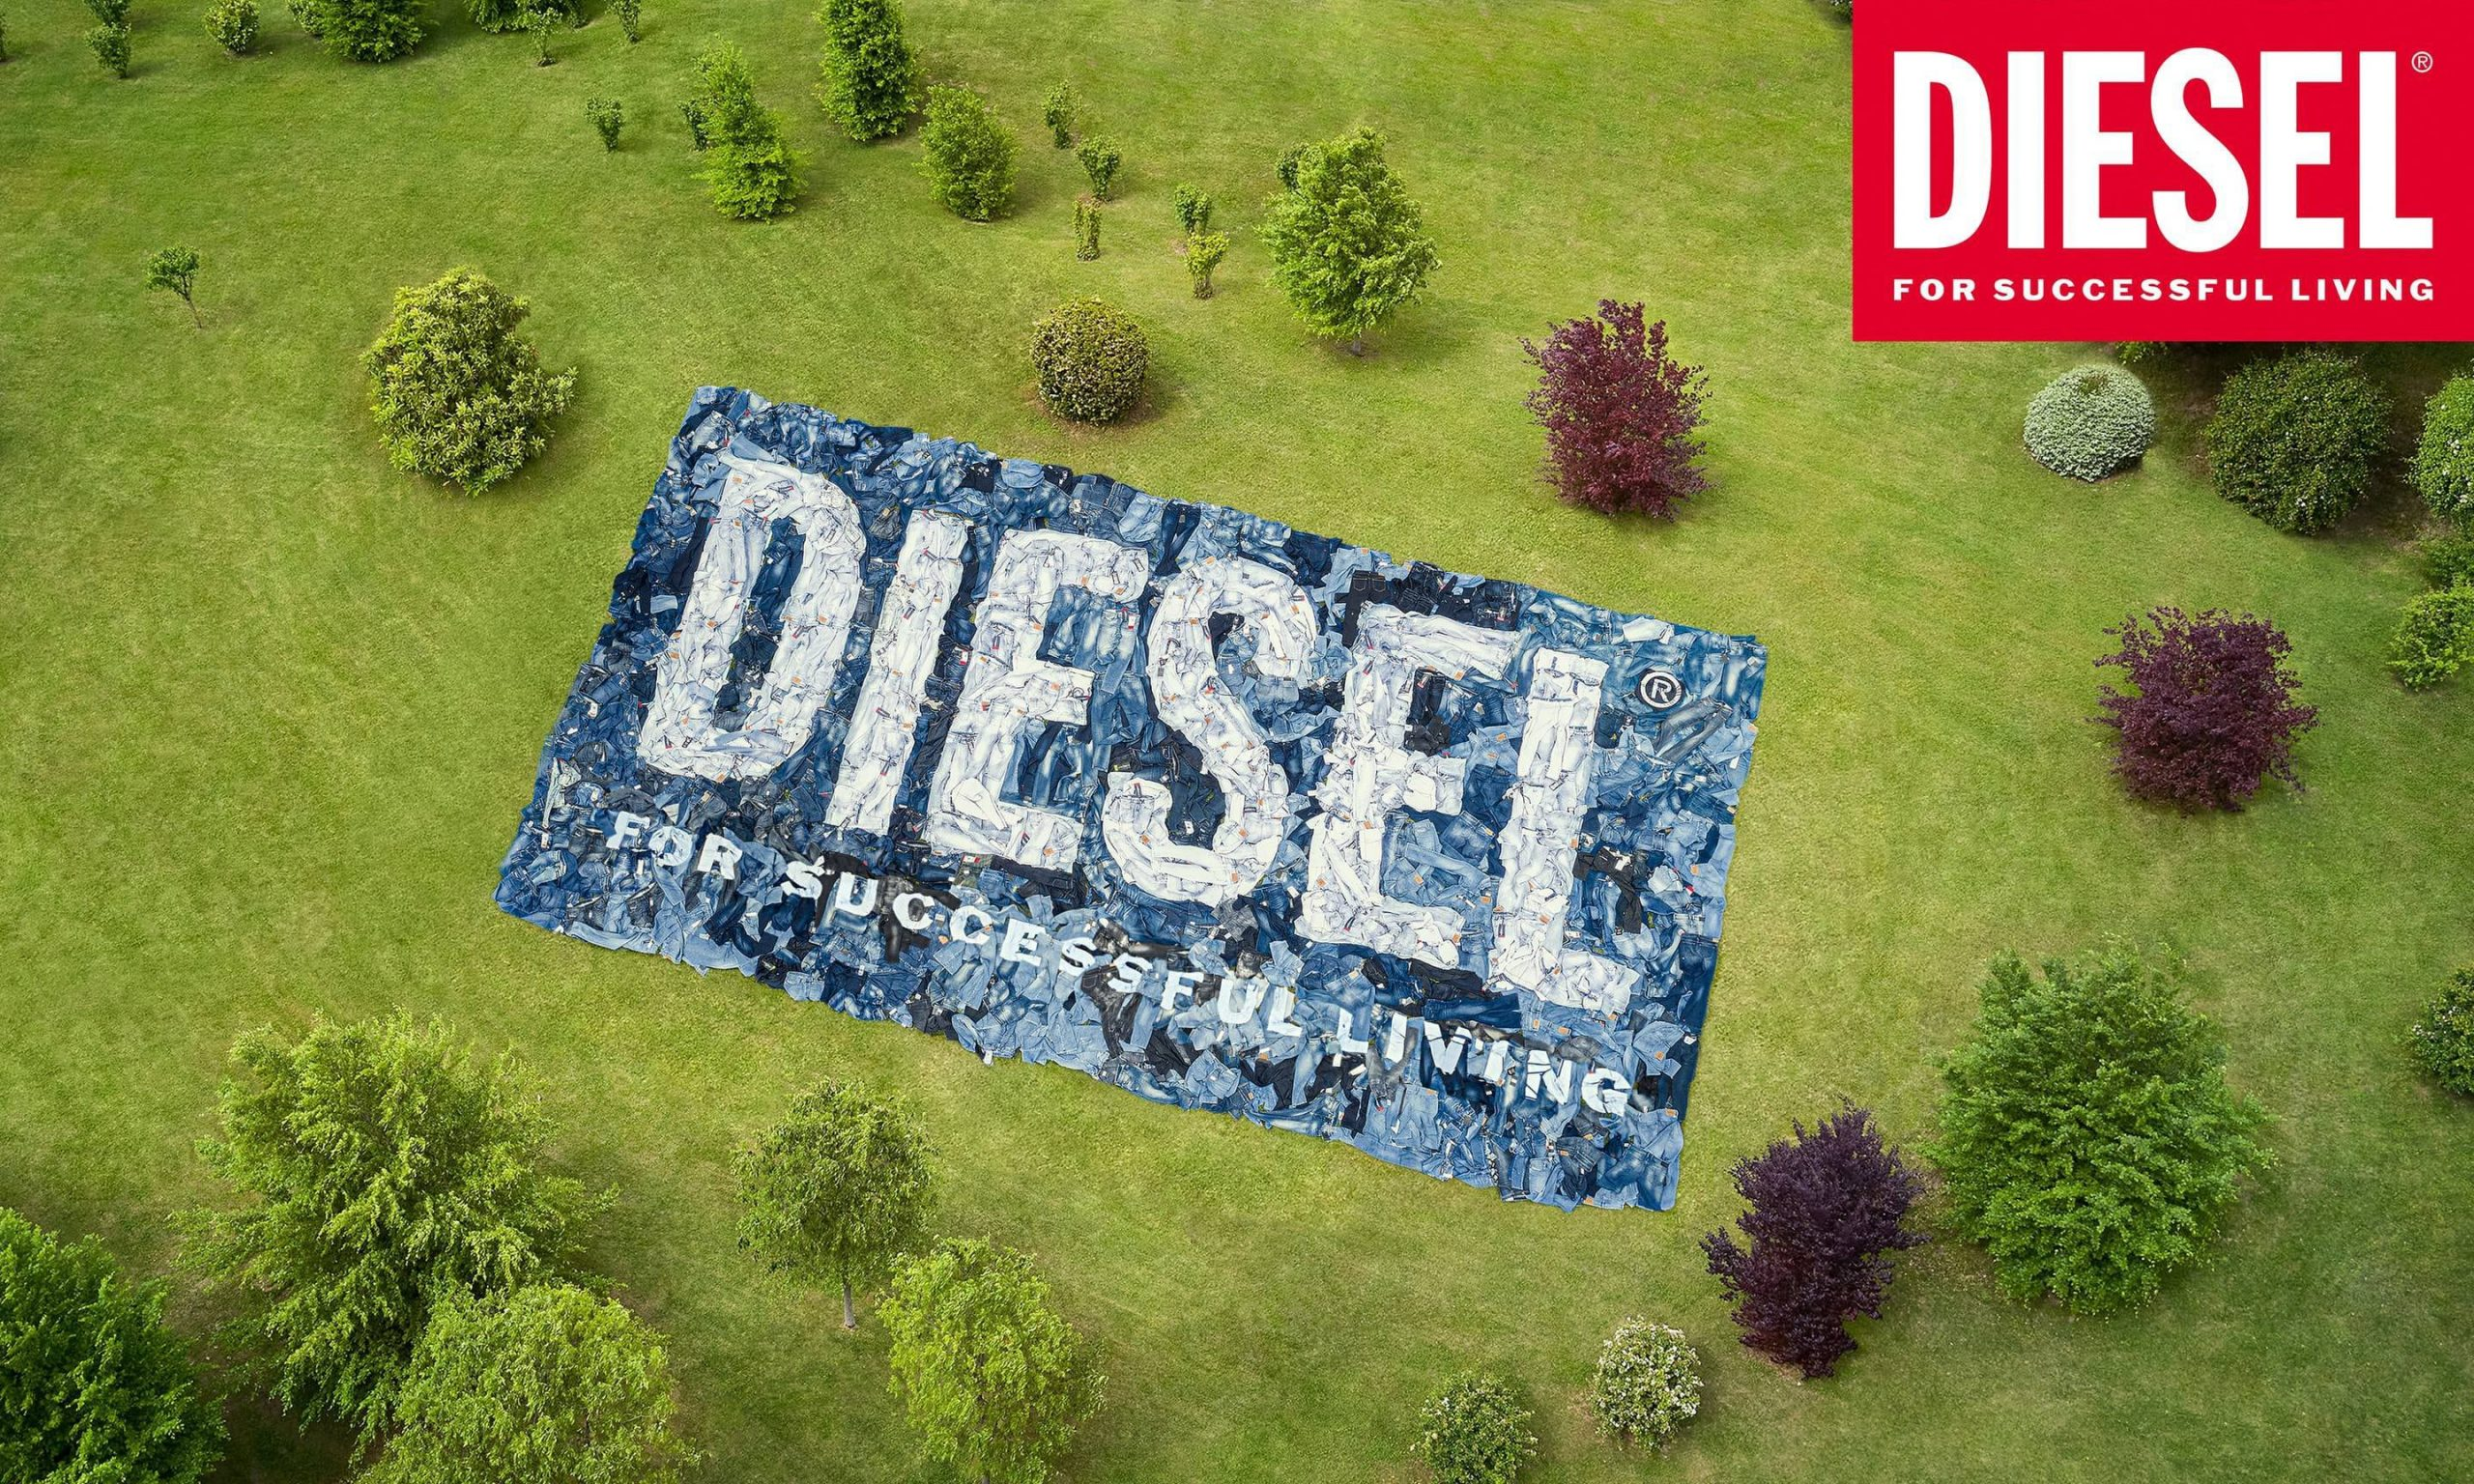 DIESEL 公布「DIESEL Library」环保项目